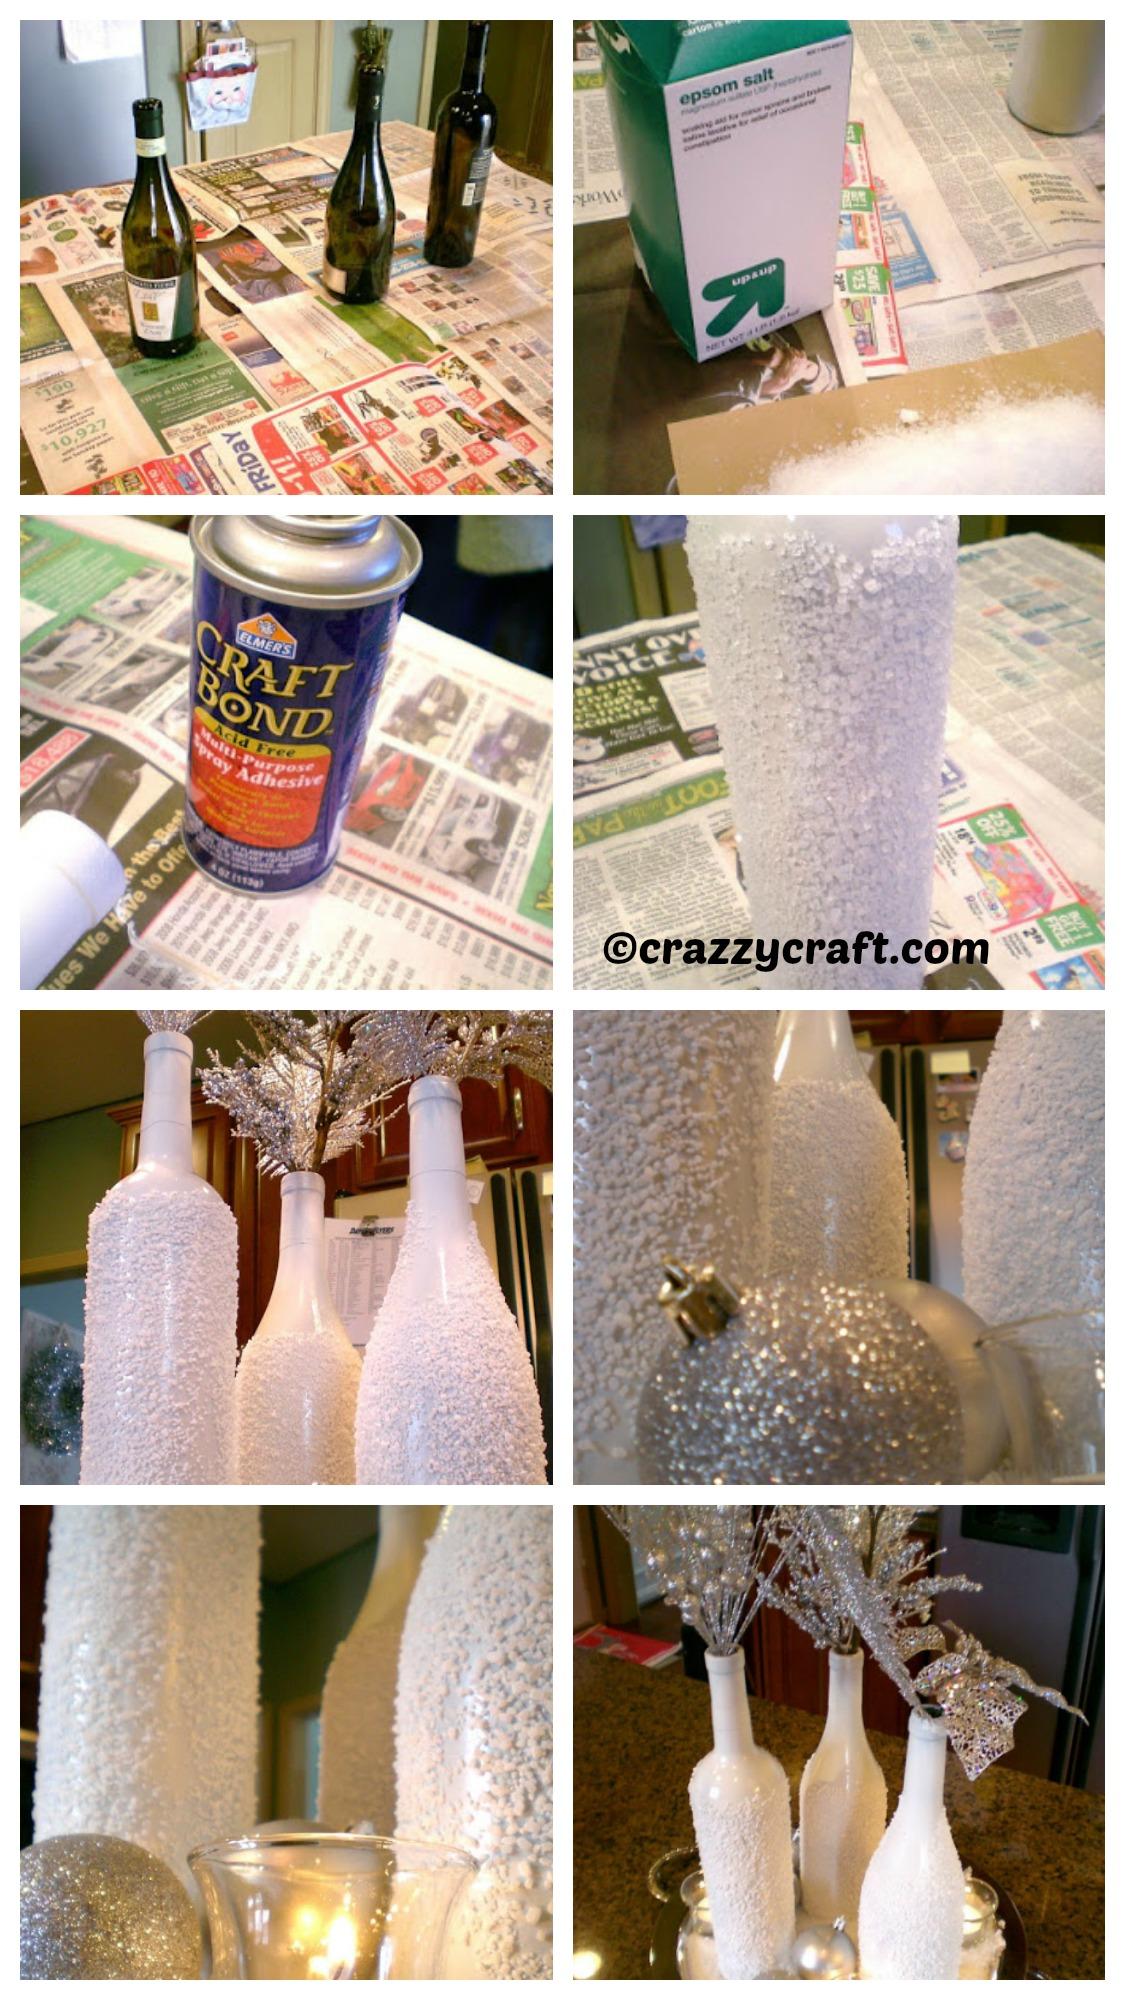 How to make a Bottle of Salt